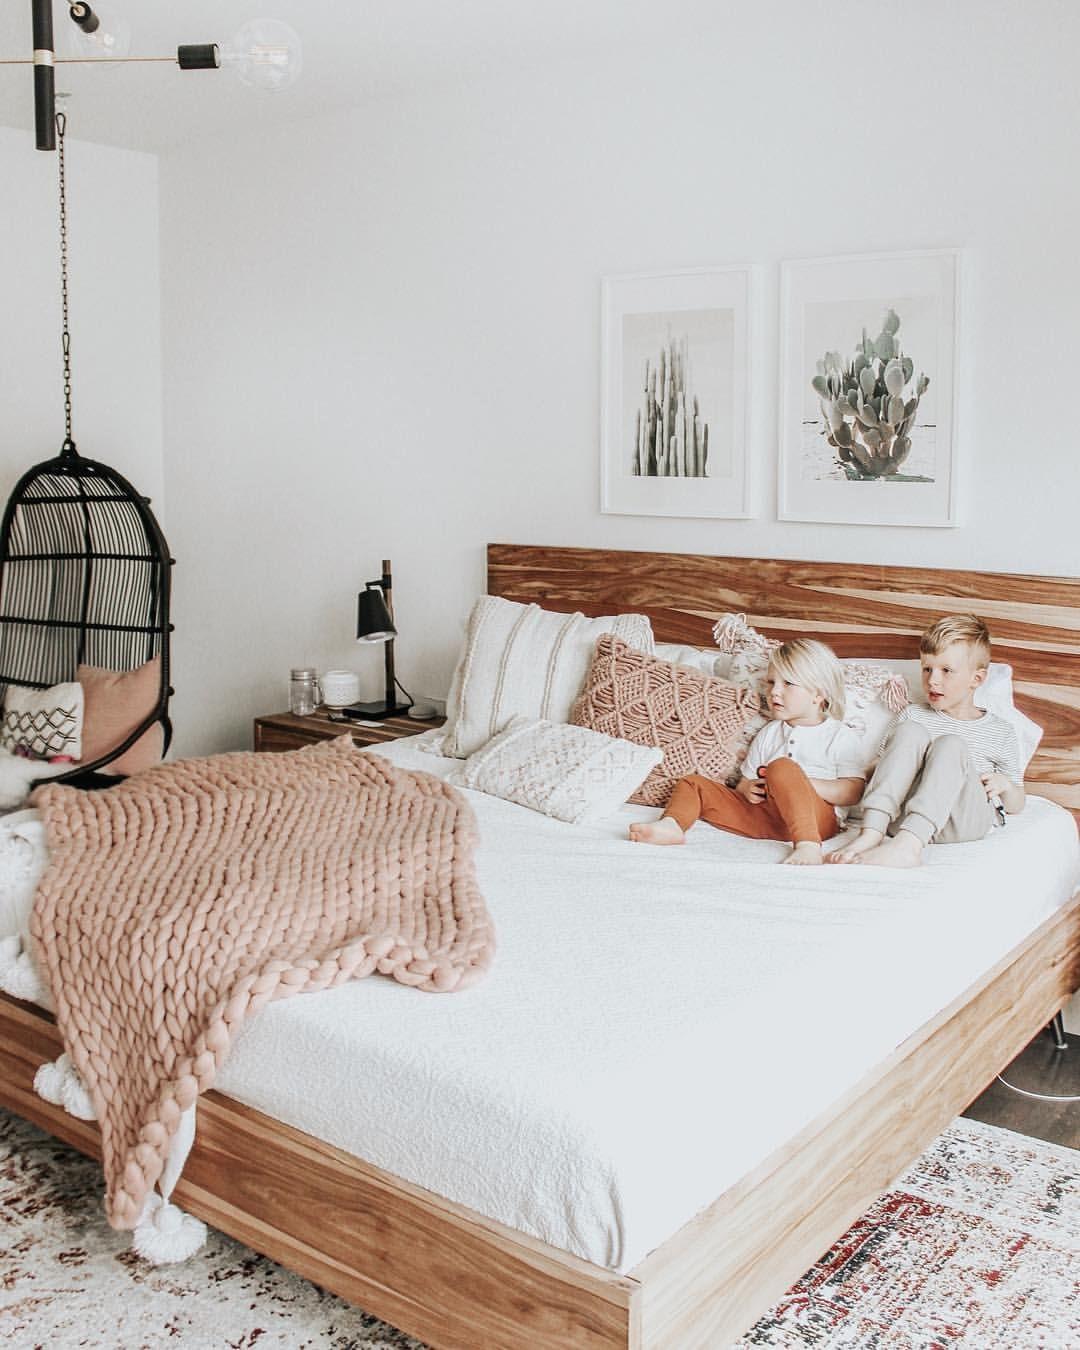 Boho bedroom @amyepeters | Bedroom vintage, Home decor ... on Modern Boho Bedroom  id=84157